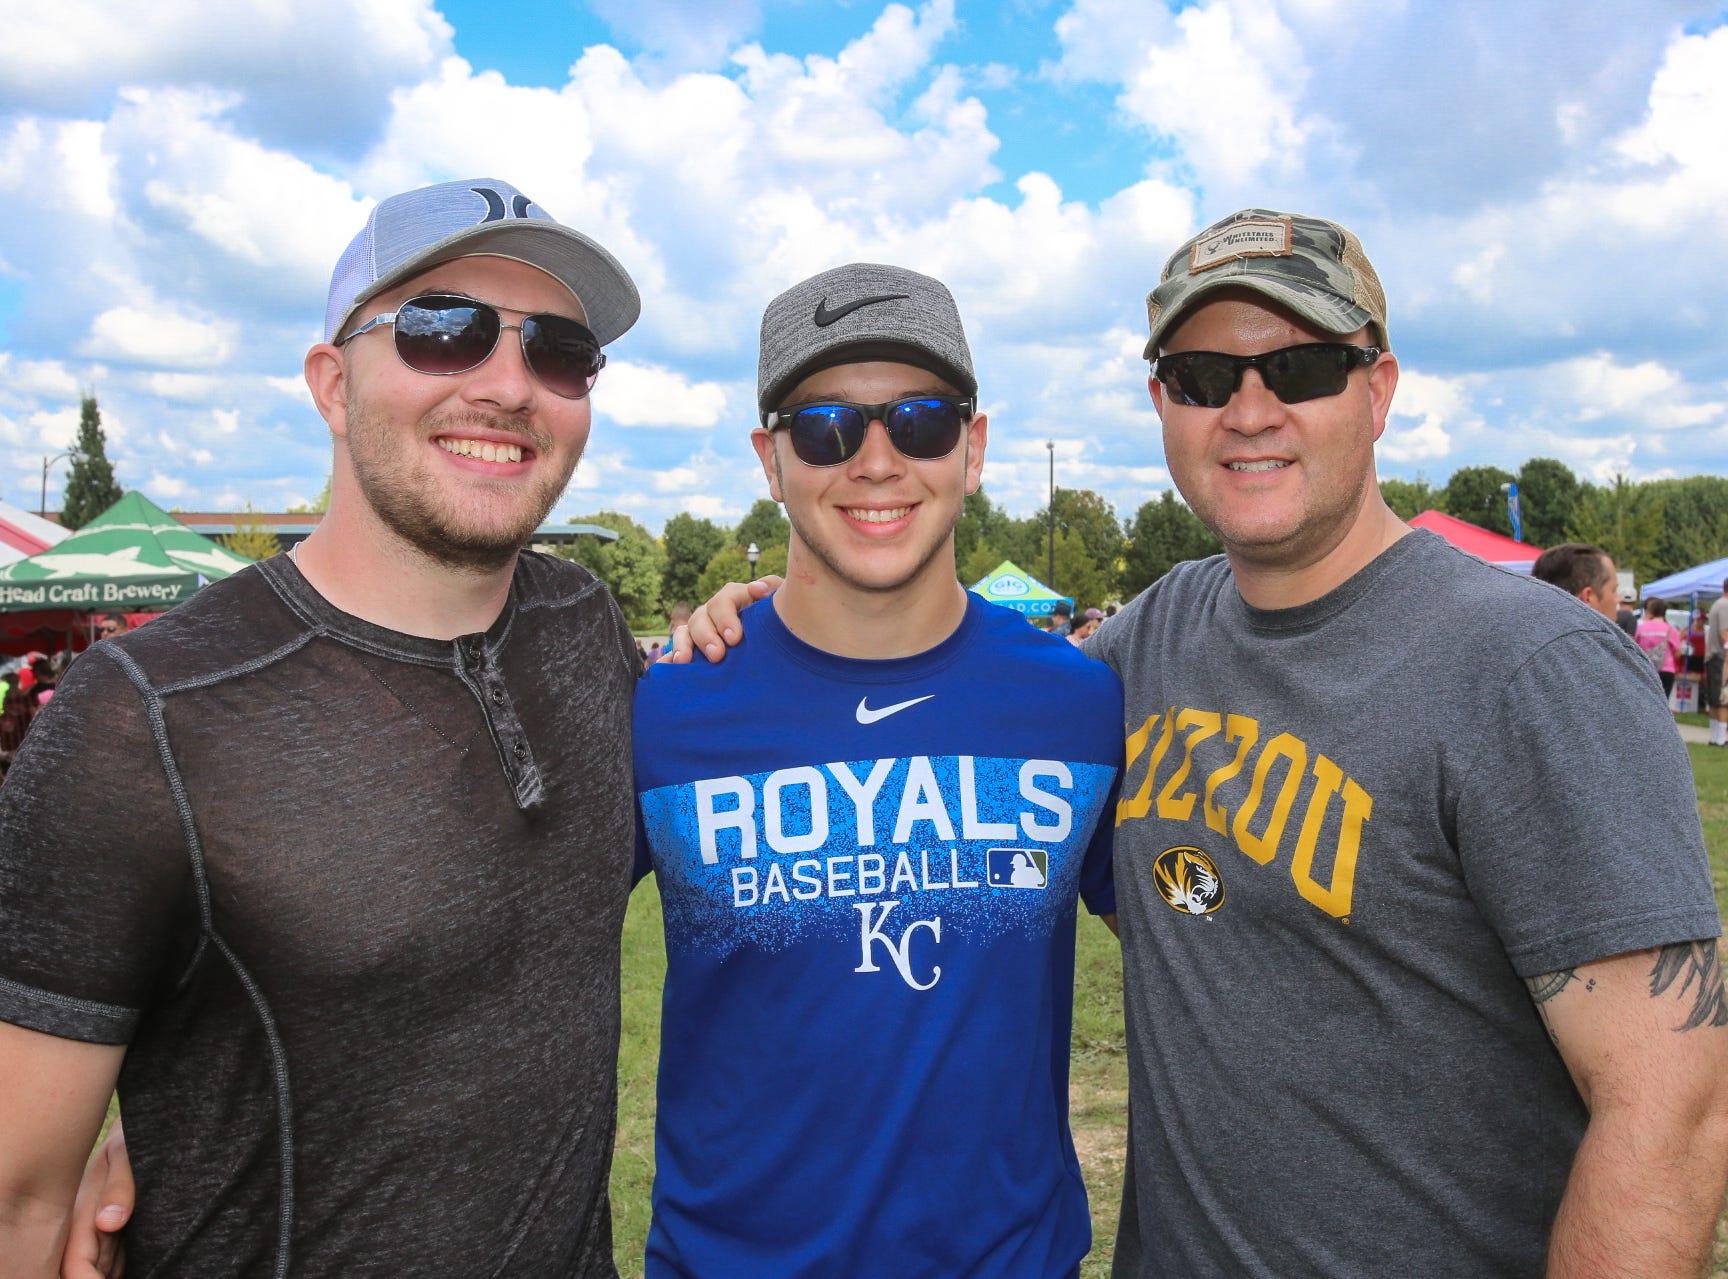 Austin, Ethan, and Travis